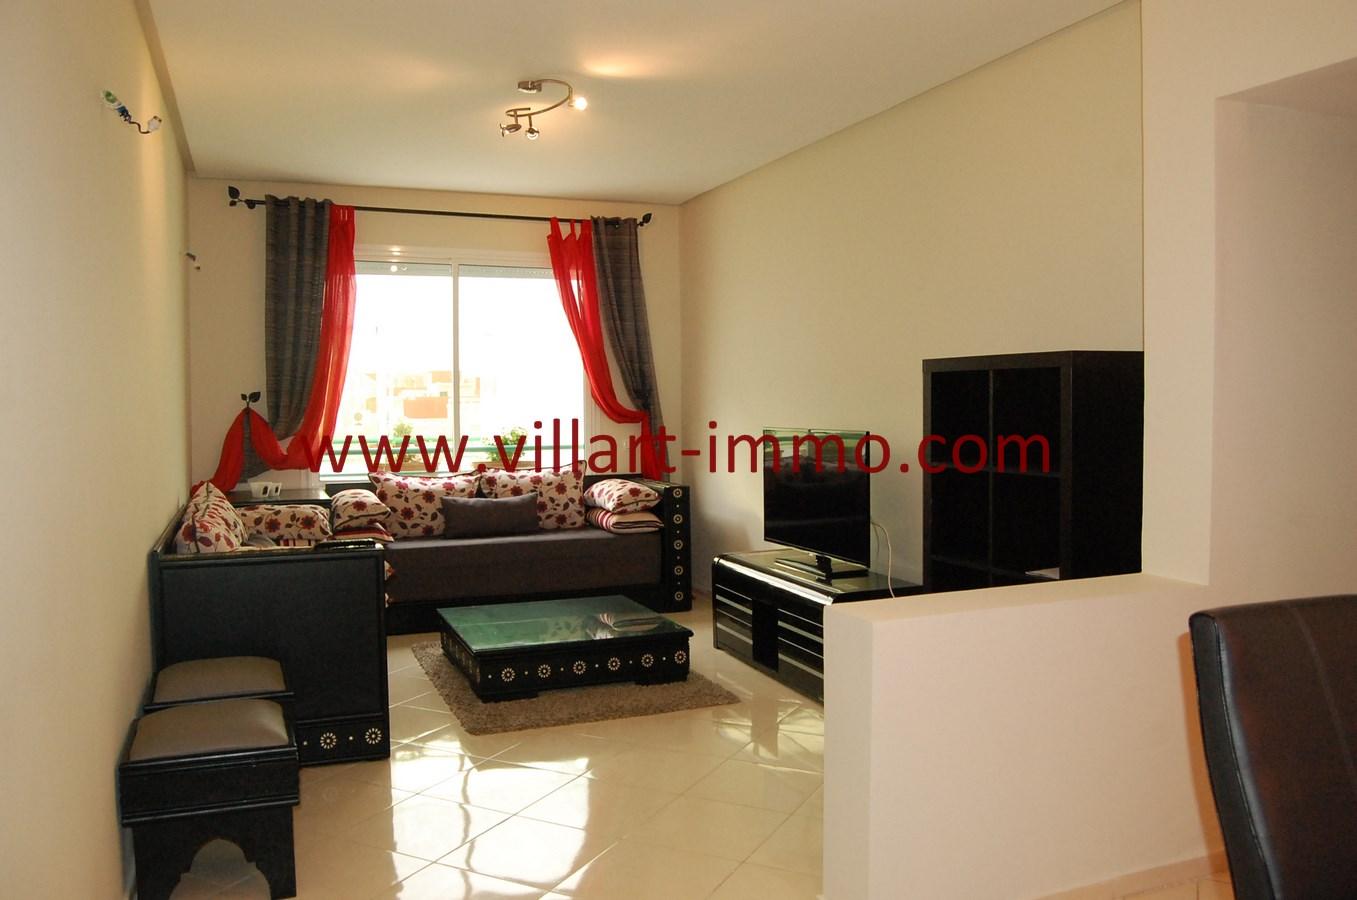 1-Vente-Appartement-Tanger-Salon 1-VA480-Villart Immo